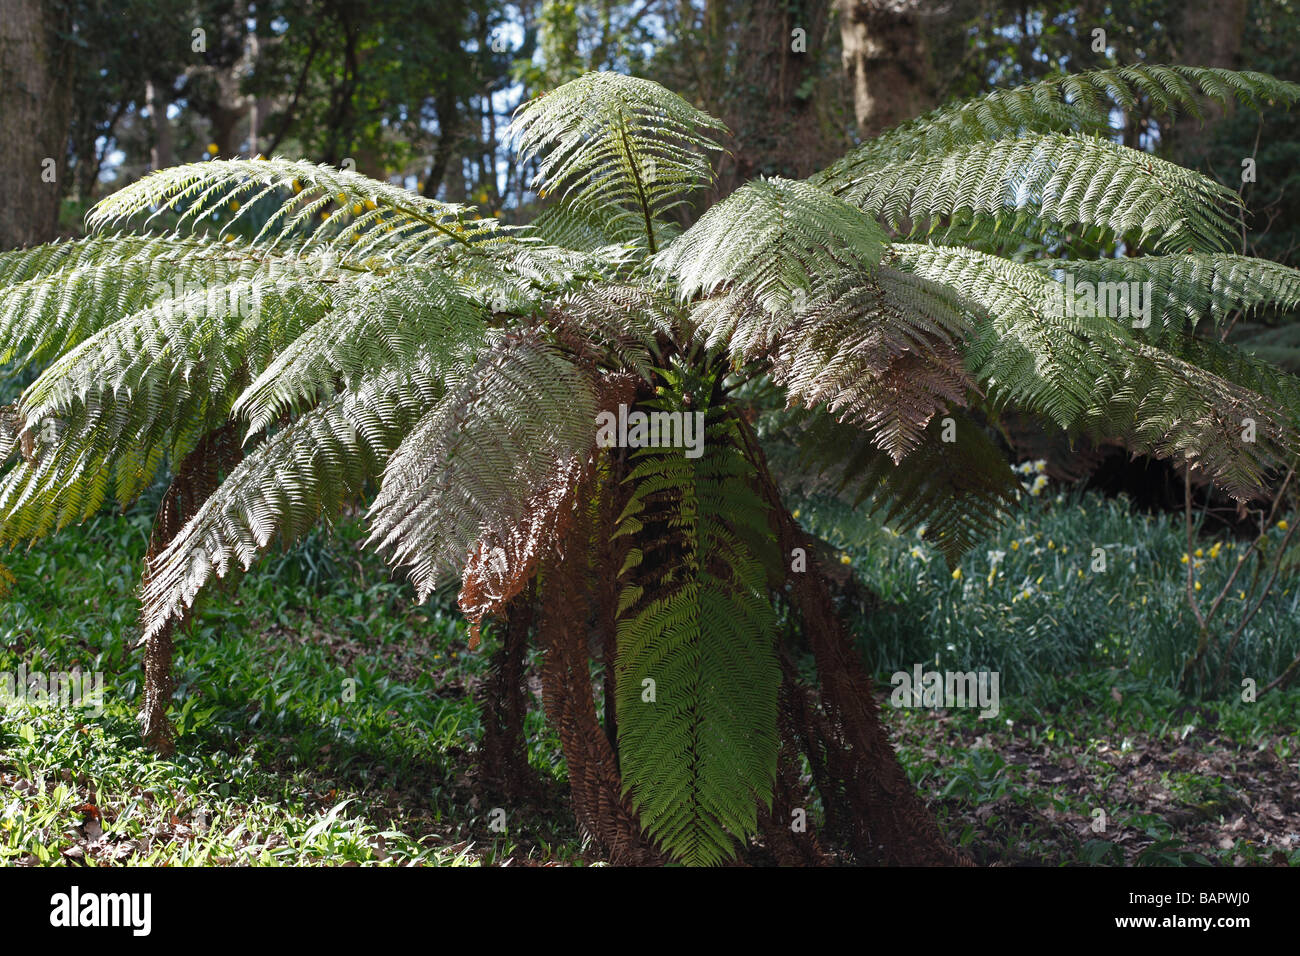 TREE FERN Cyathea australis GROWING IN WOODLAND GLADE - Stock Image